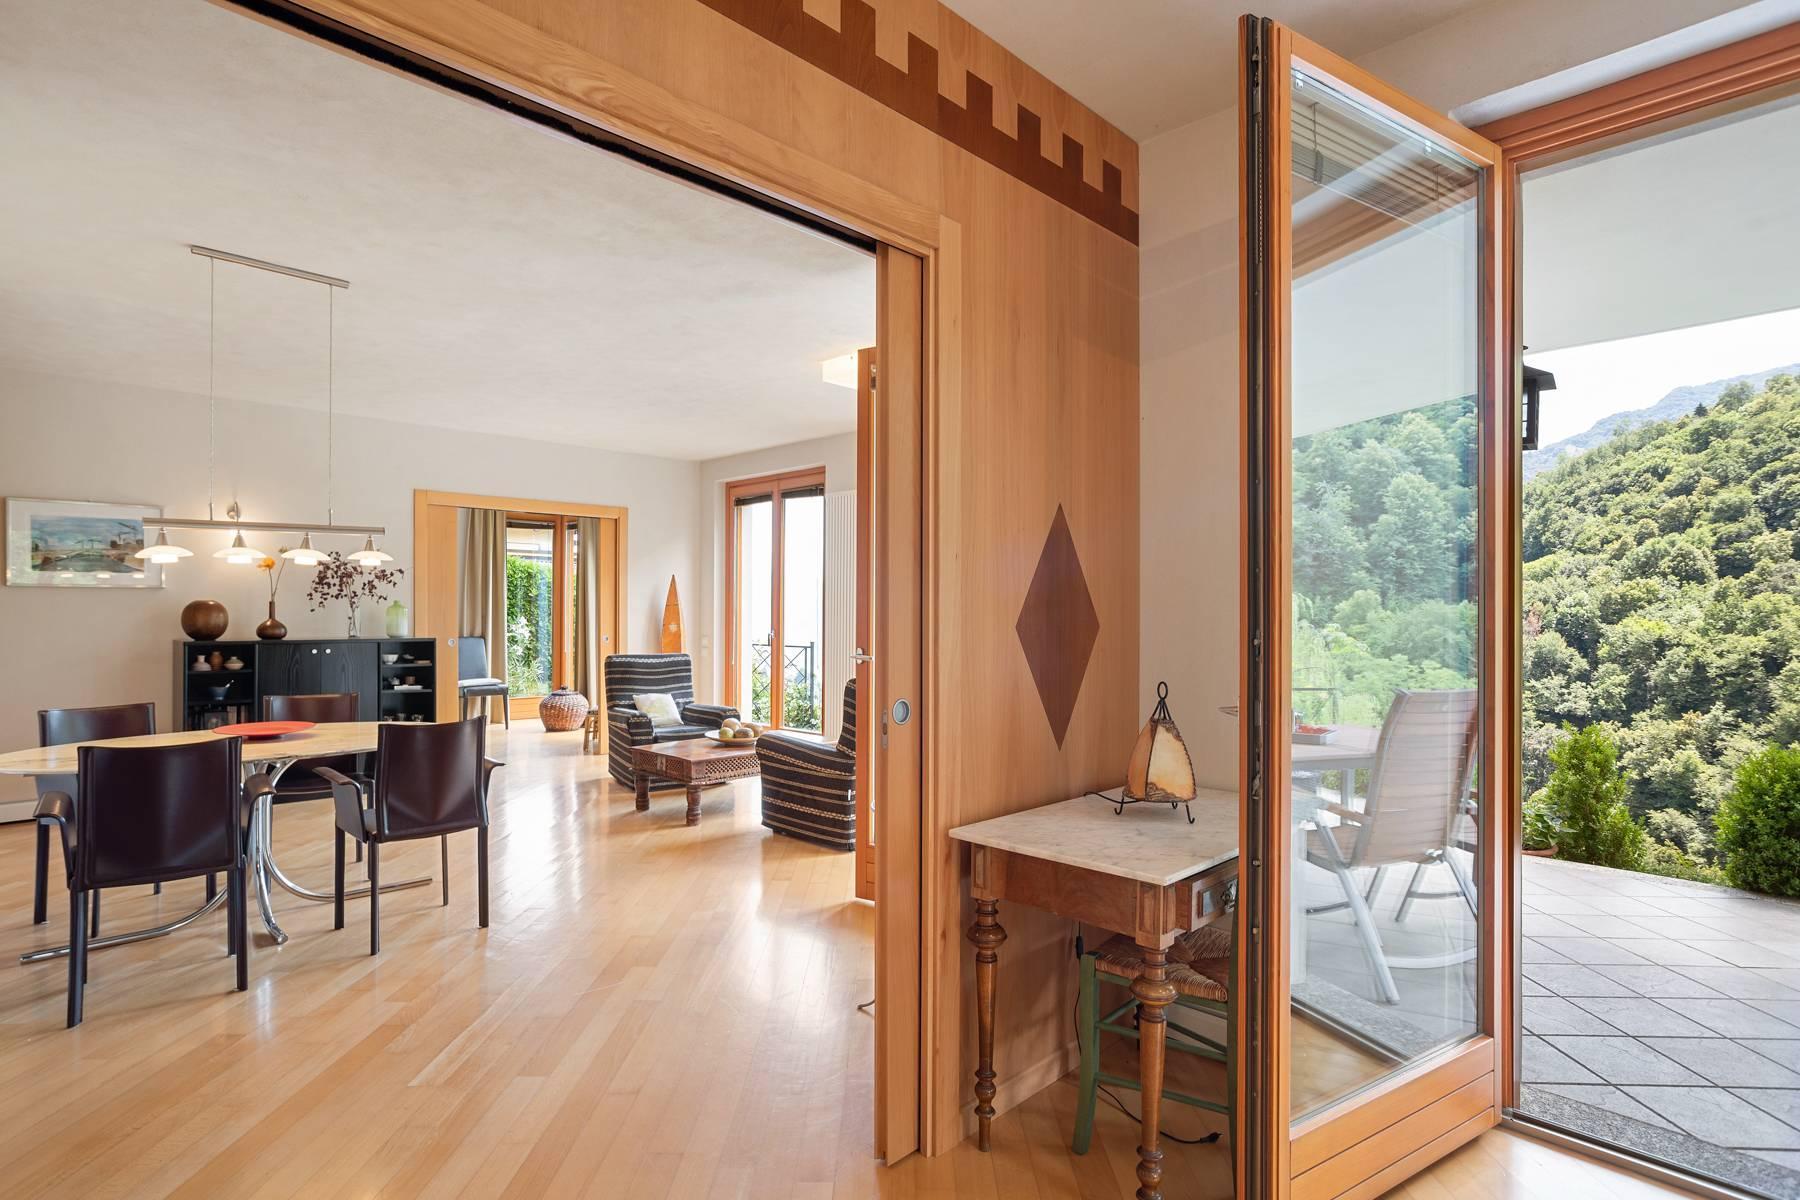 Splendida villa moderna sulla collina soleggiata sopra Argegno - 33